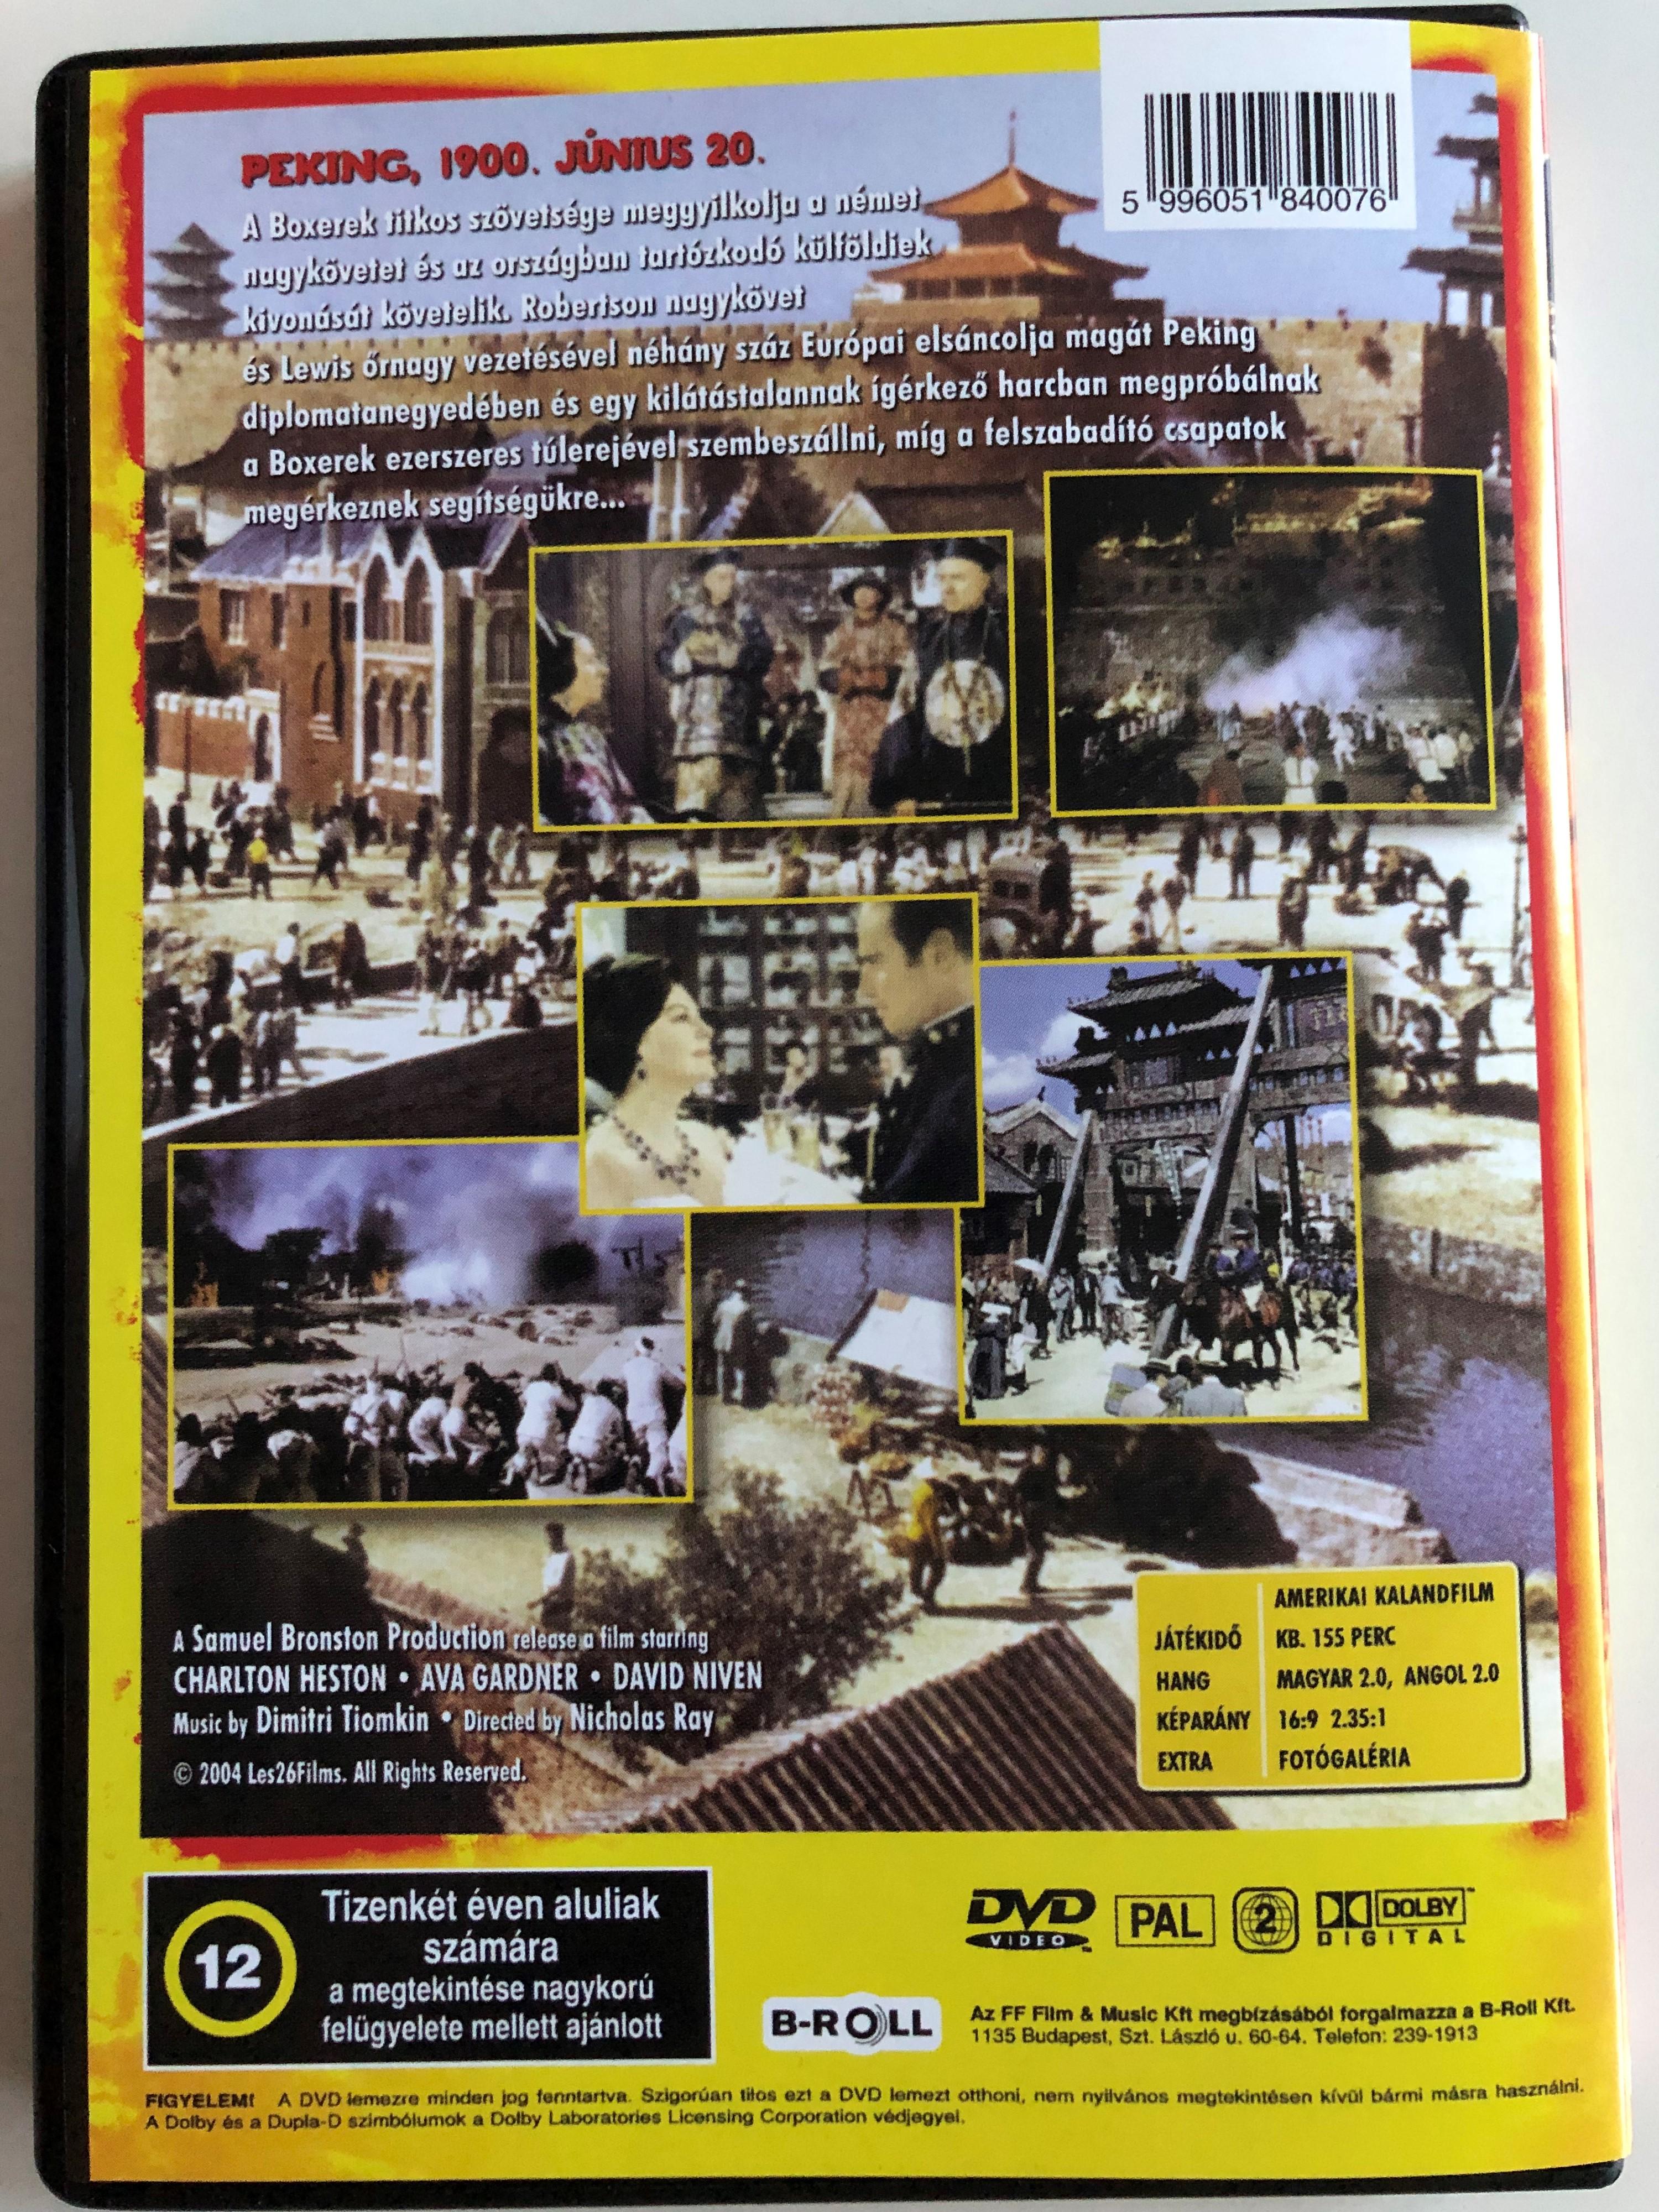 55-days-at-peking-dvd-1963-55-nap-pekingben-directed-by-nicholas-ray-2.jpg